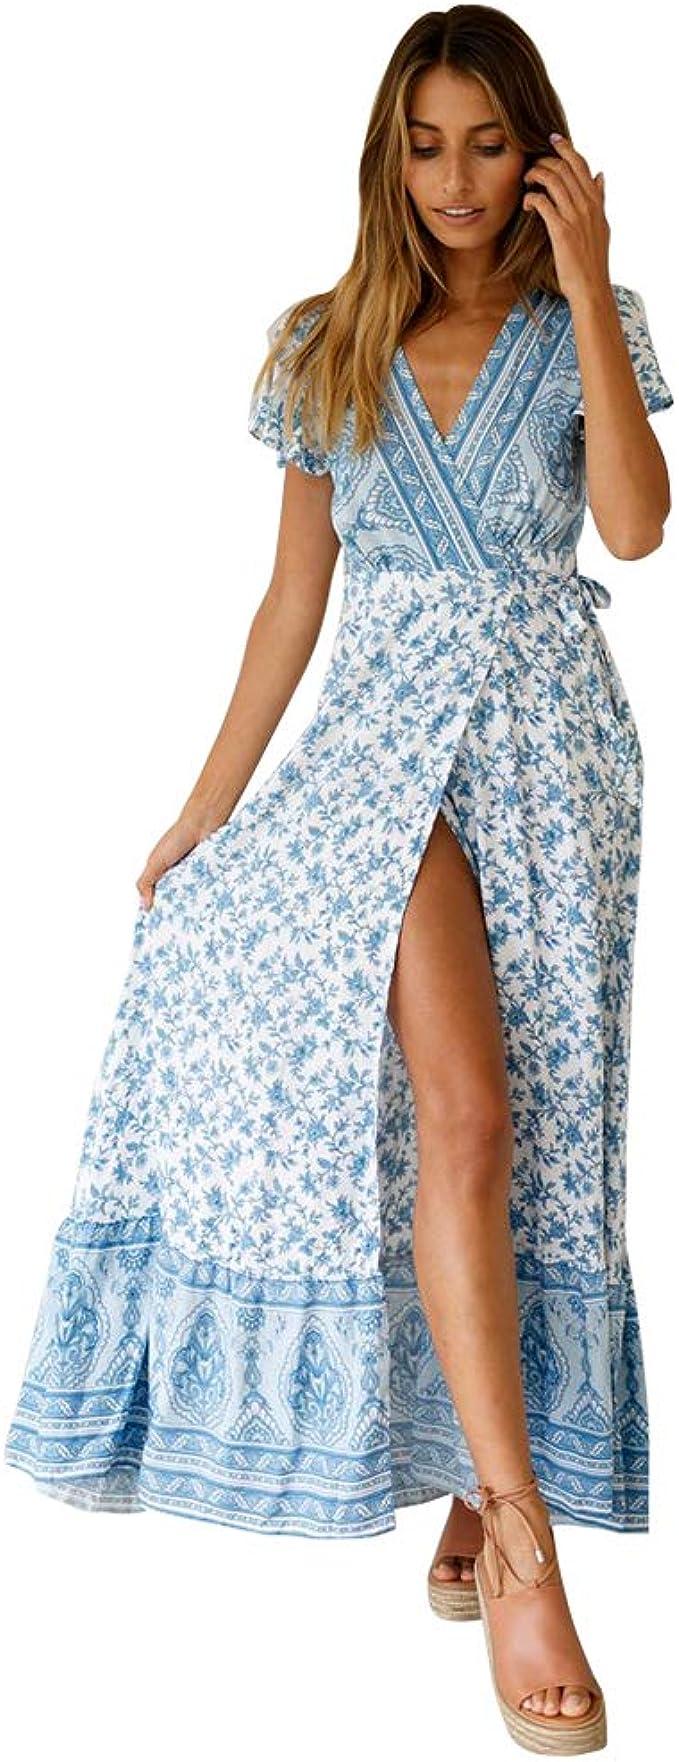 Frauen Boho Blumen Kurzarm V-Ausschnitt Minikleid Sommerferien Sommerkleid